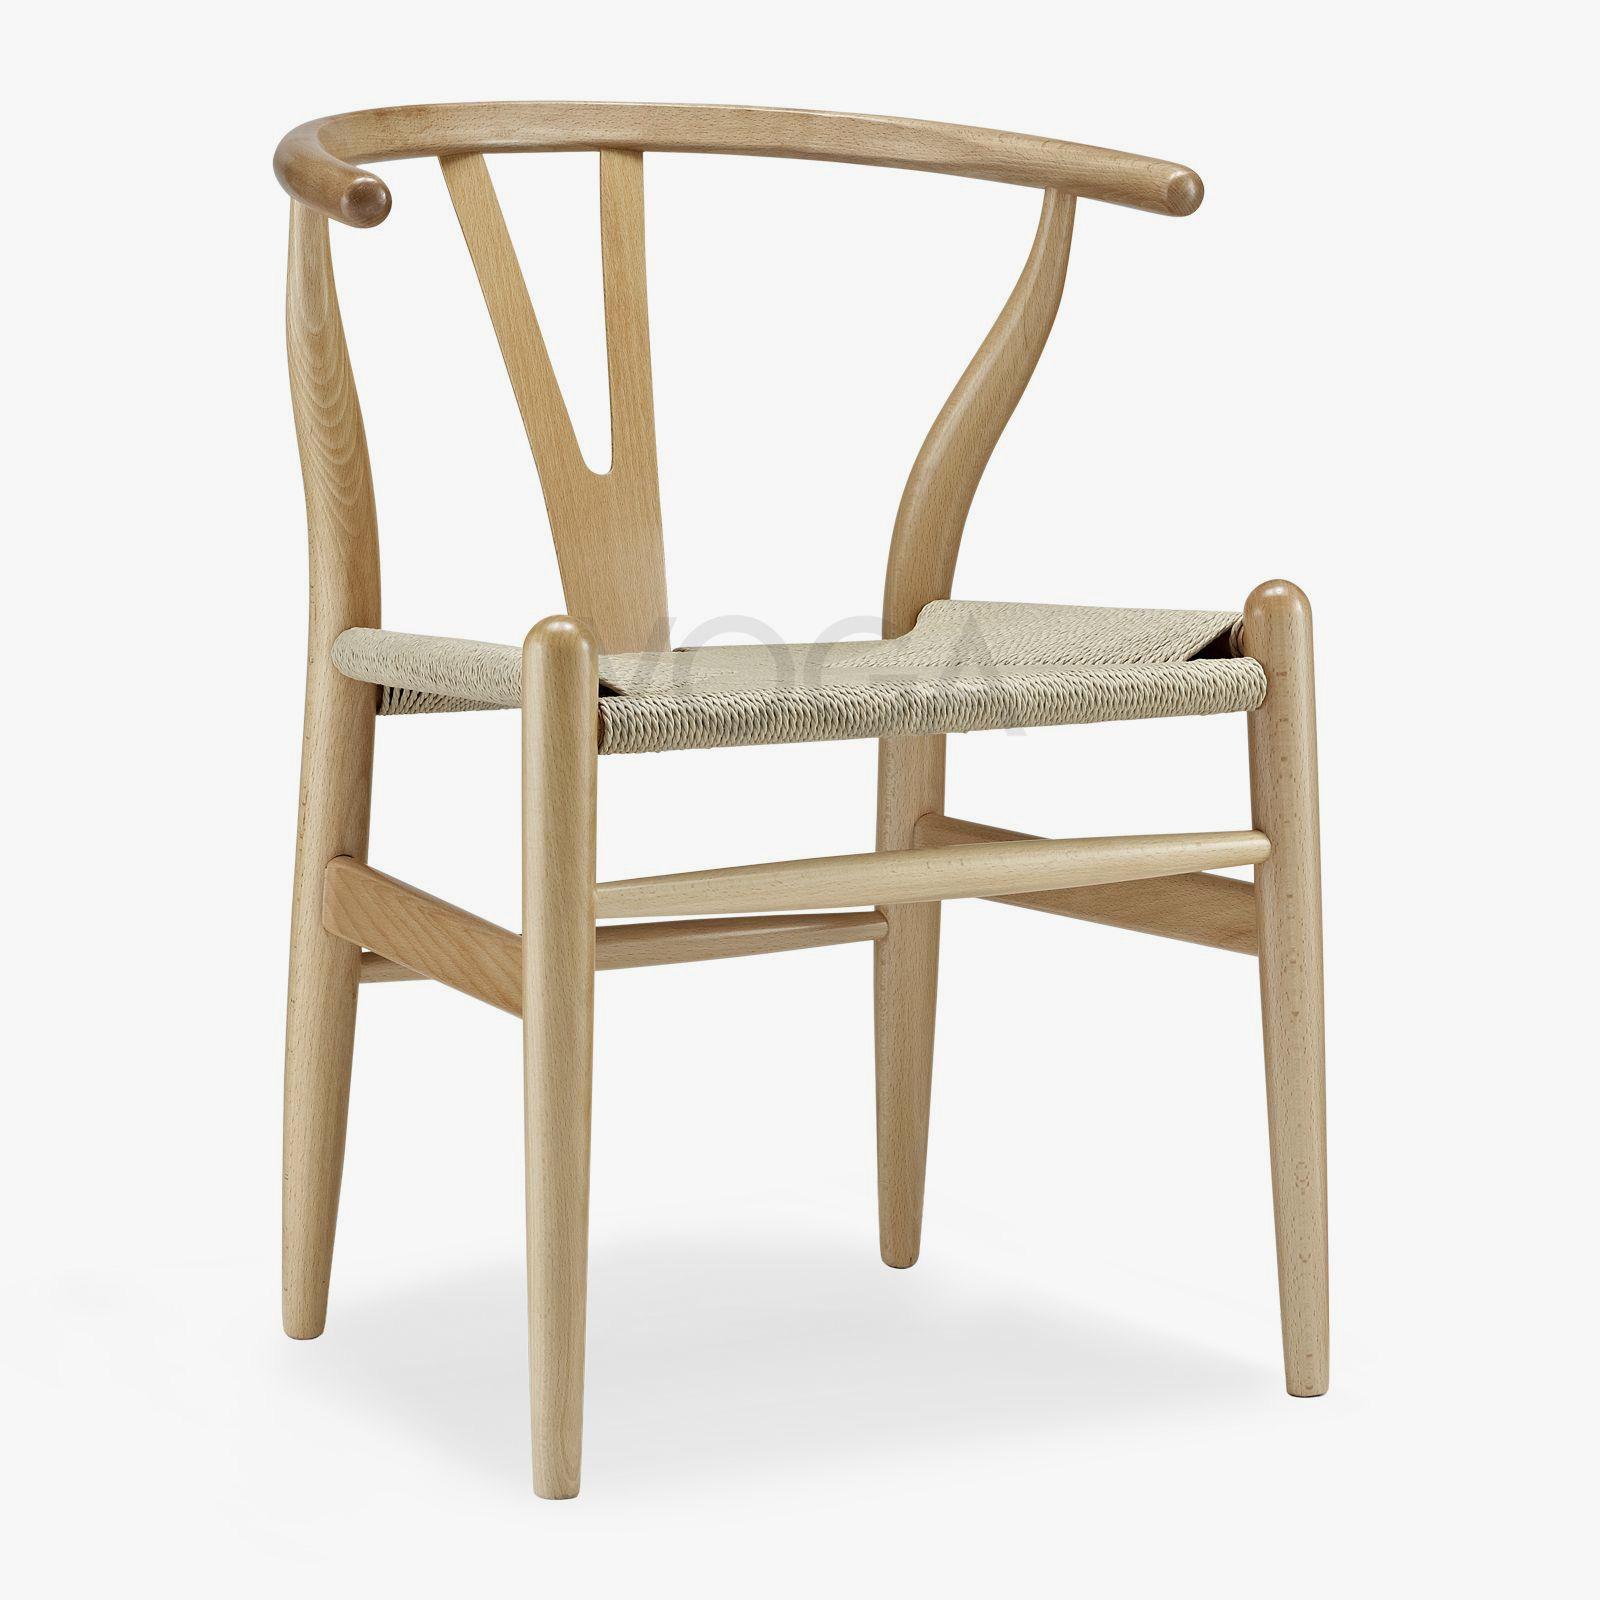 design stoler av hans j wegner i original kvalitet kj p y stol hos voga moodboard pinterest. Black Bedroom Furniture Sets. Home Design Ideas